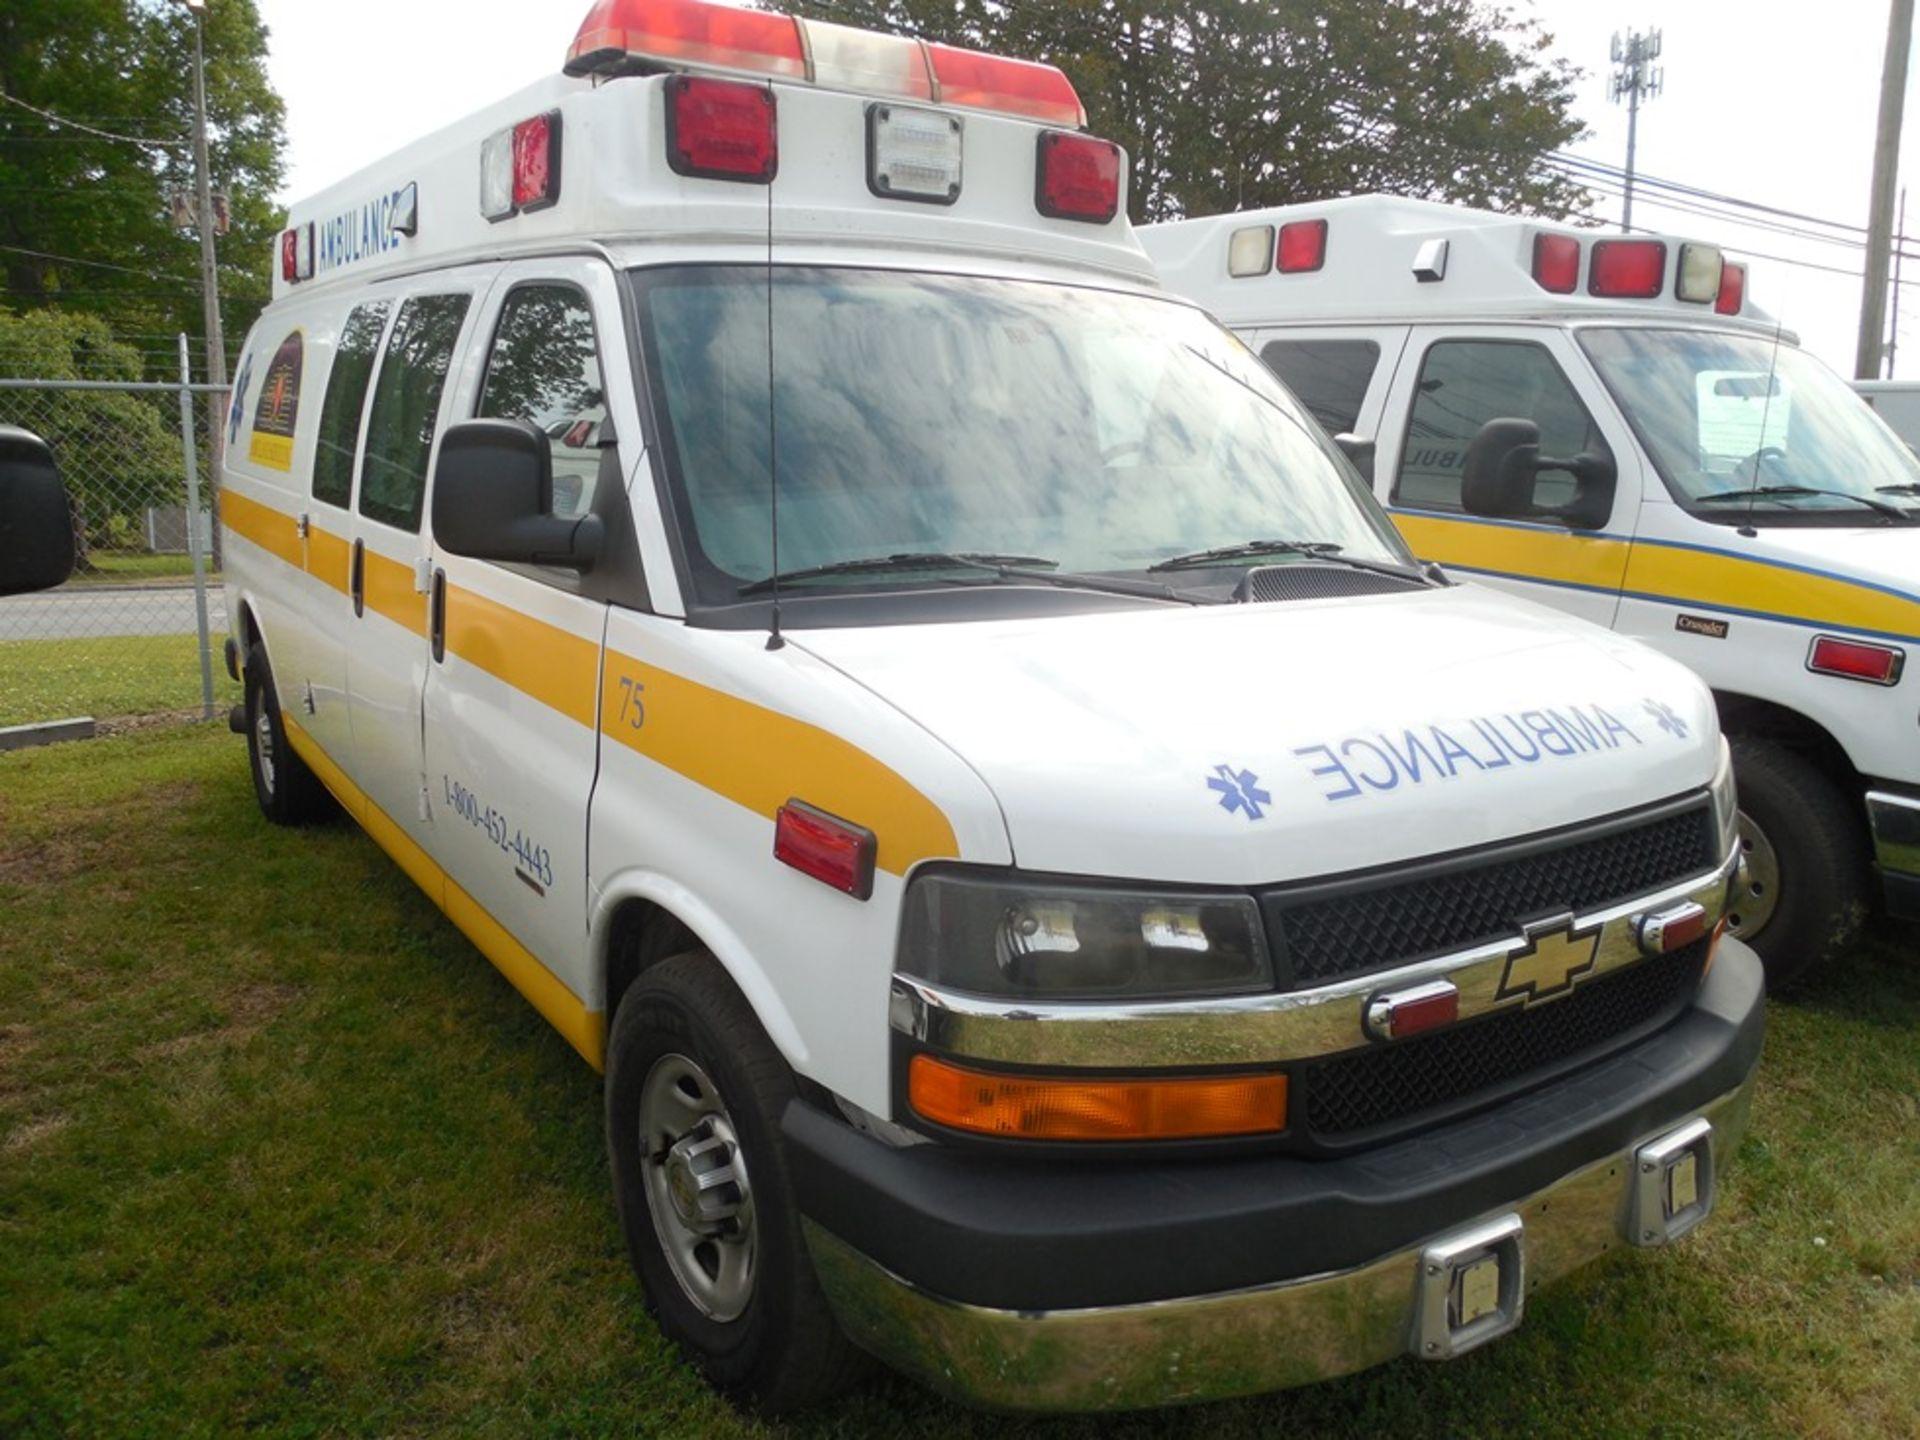 2013 Chev van ambulance dsl, Express Stable Trac 204,709 miles vin# 1GBZGUC13D1130018 - Image 3 of 6